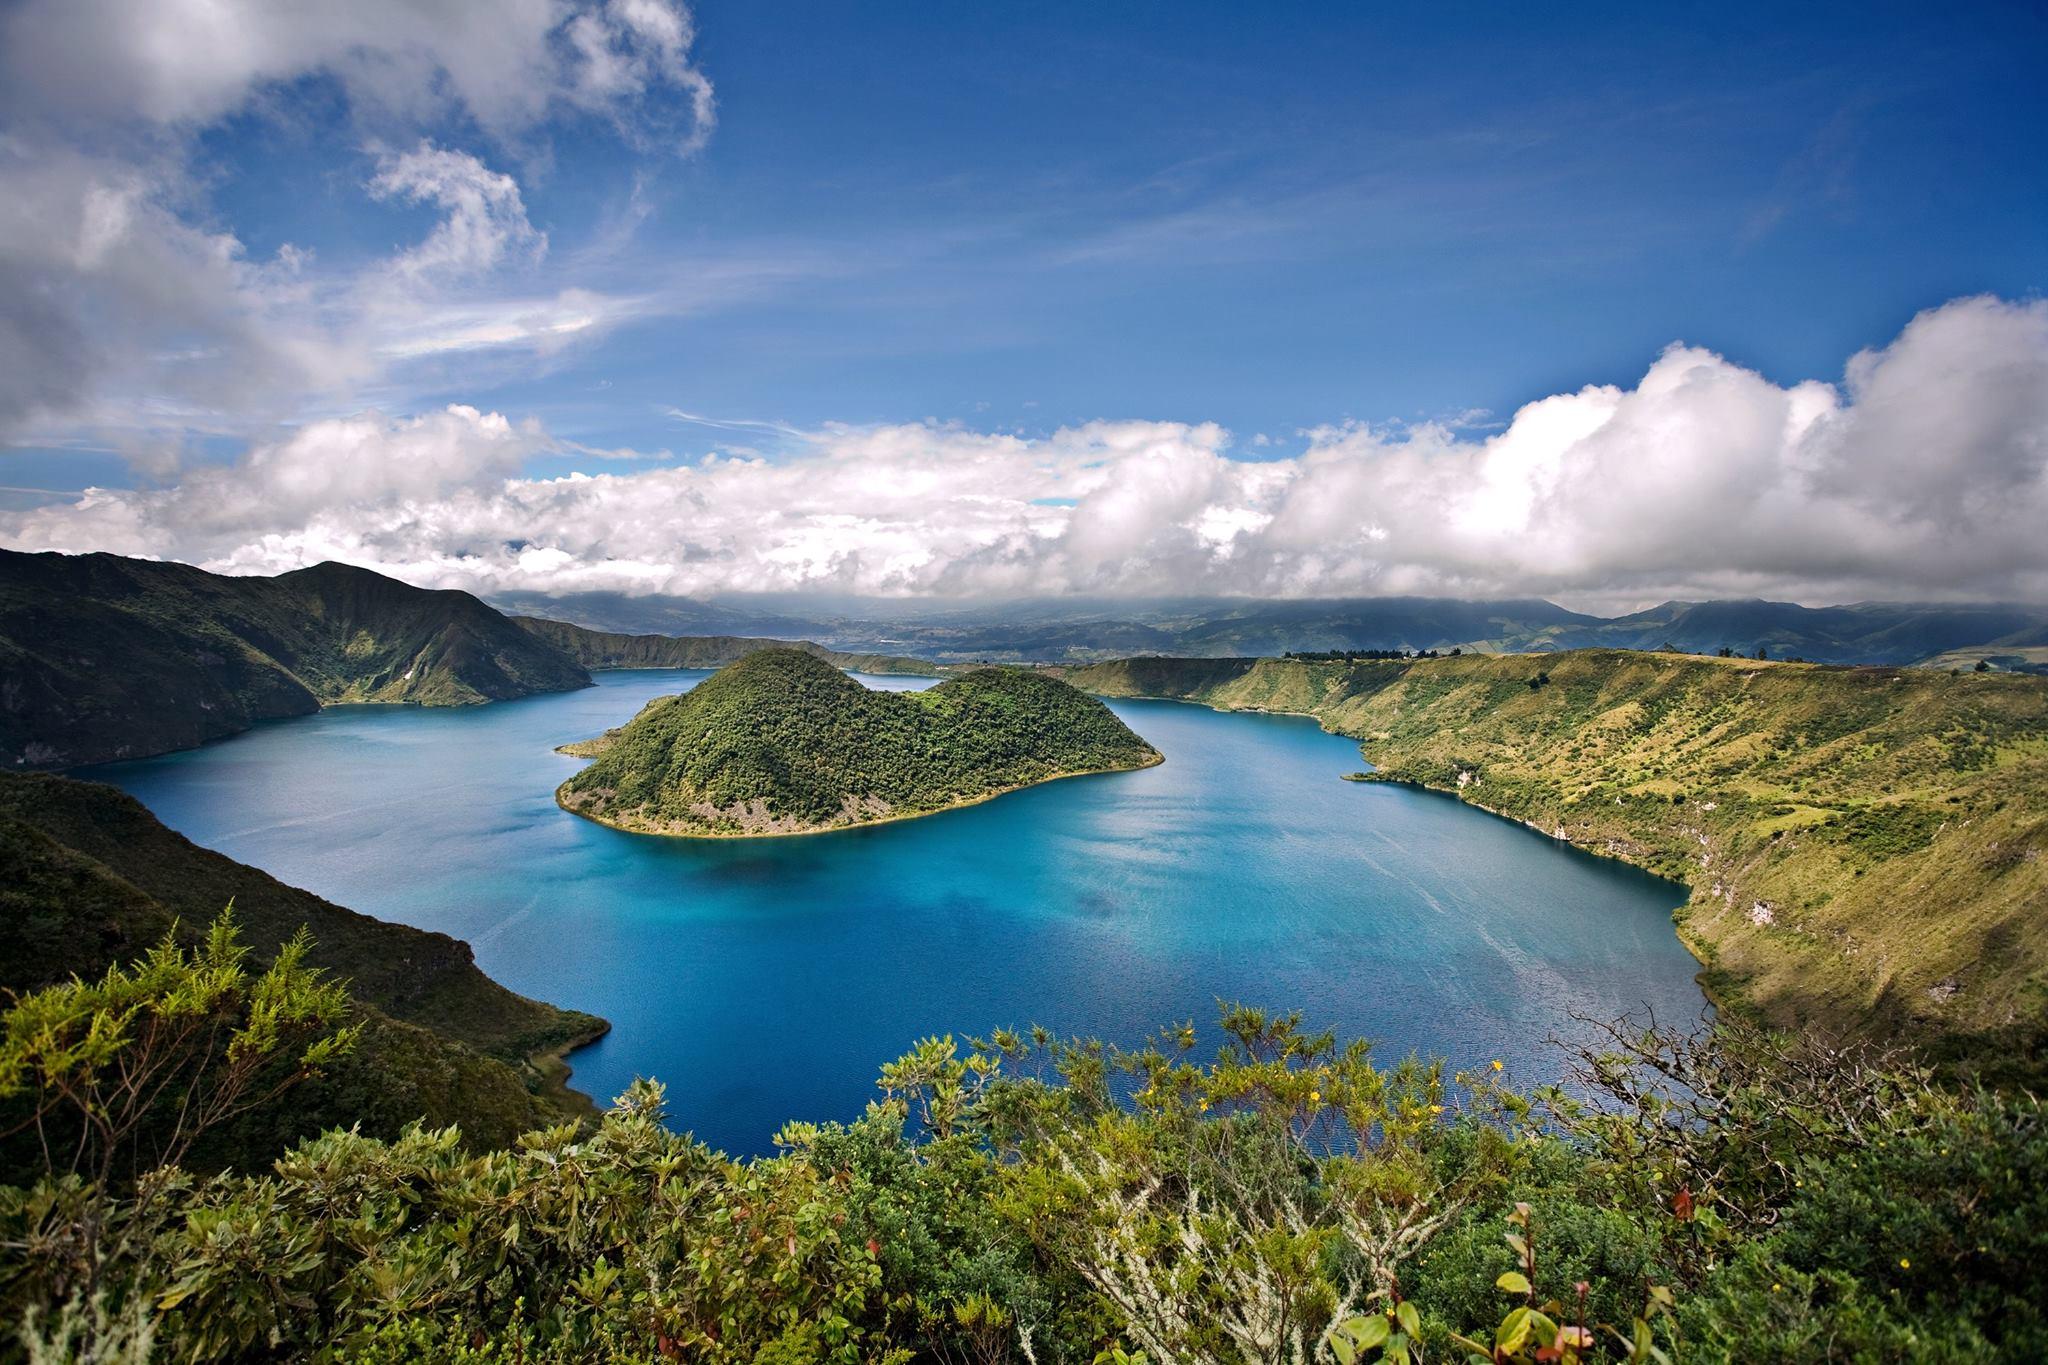 Cuicocha Lagoon in Ecuador